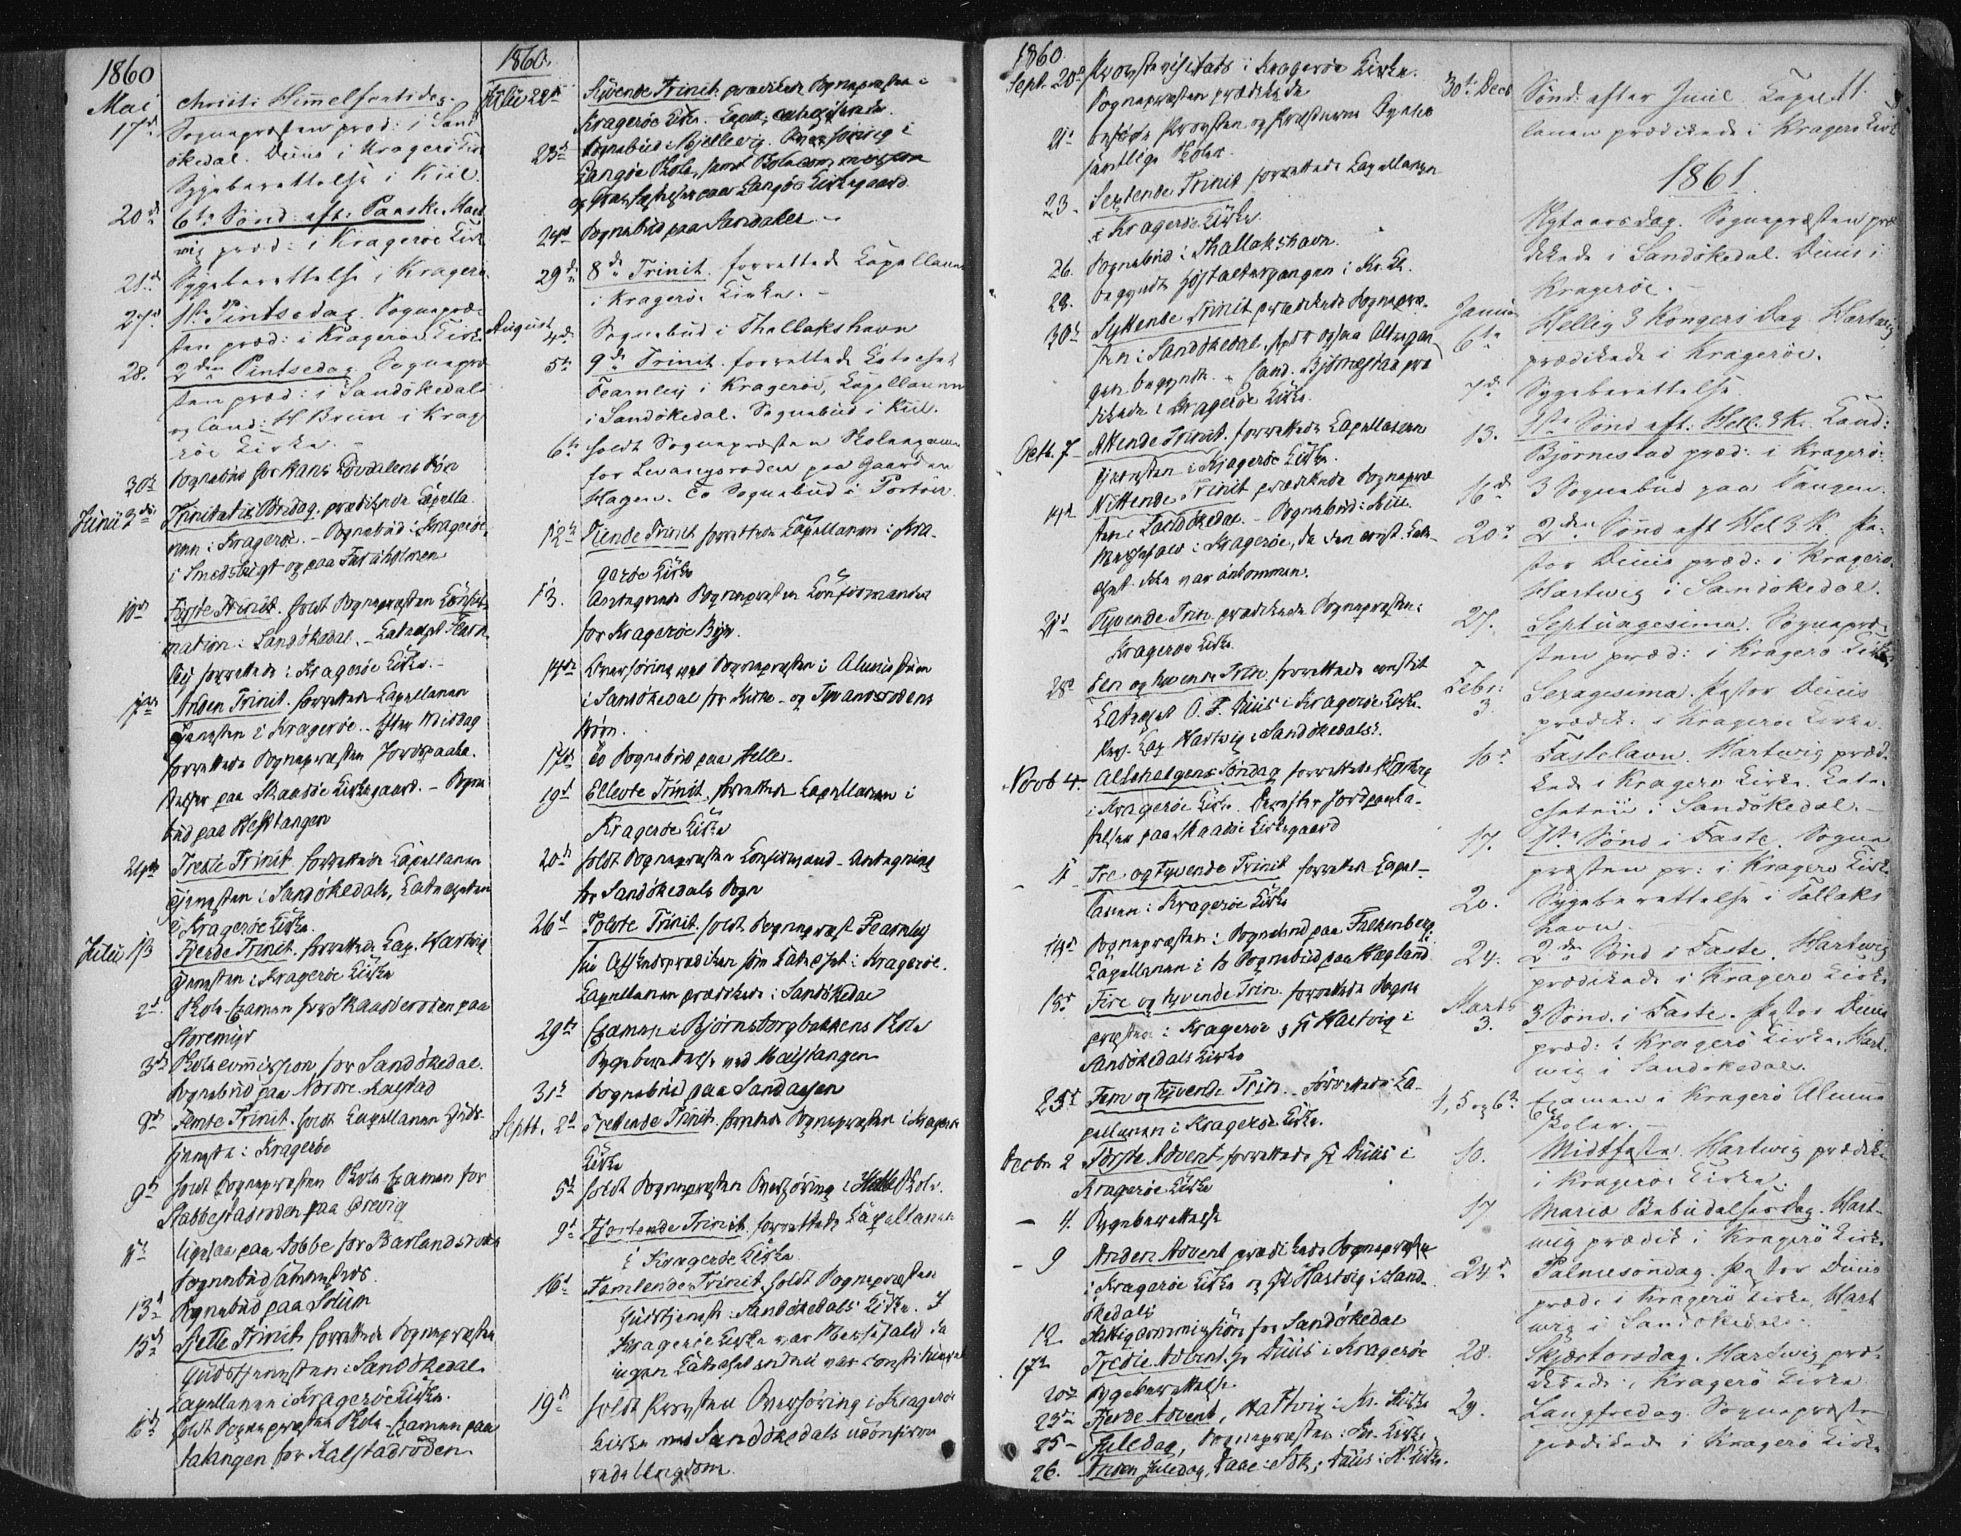 SAKO, Kragerø kirkebøker, F/Fa/L0006: Ministerialbok nr. 6, 1847-1861, s. 11